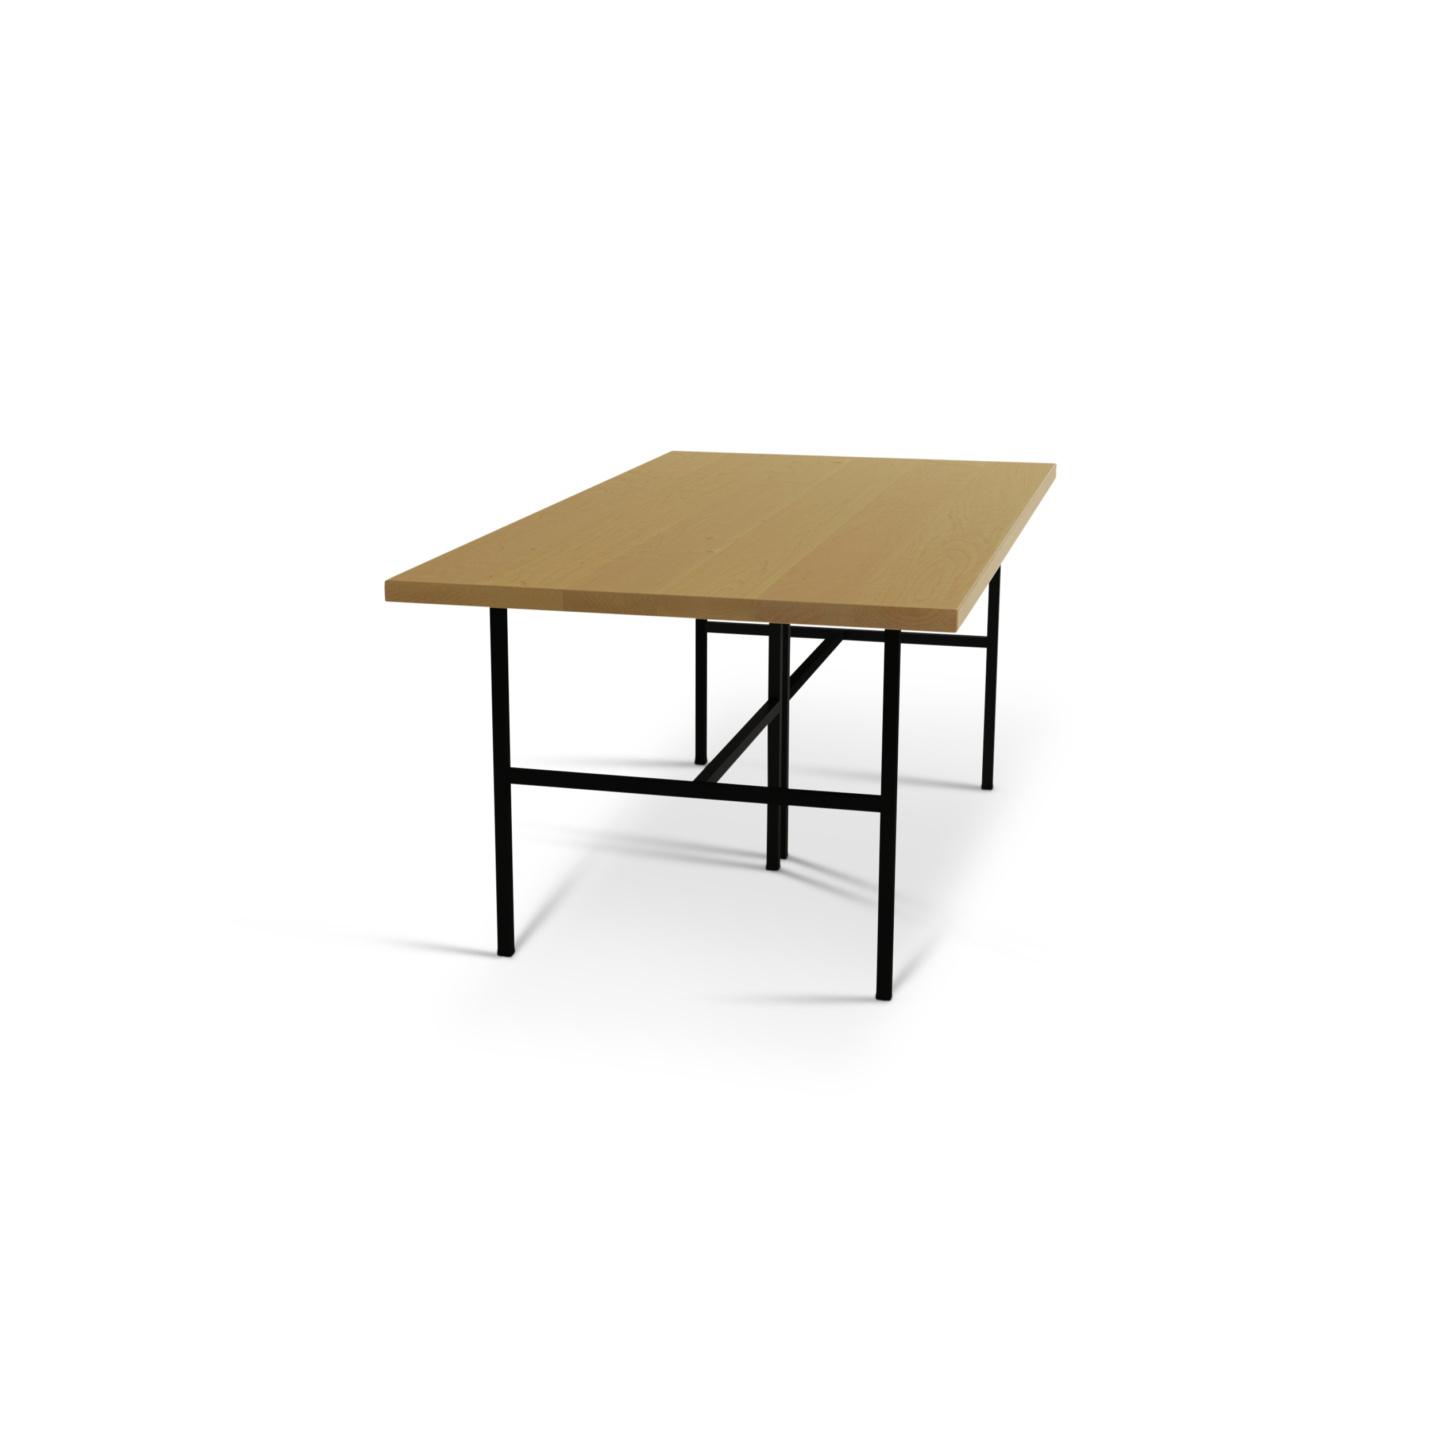 6 foot maple kitchen table on black metal legs